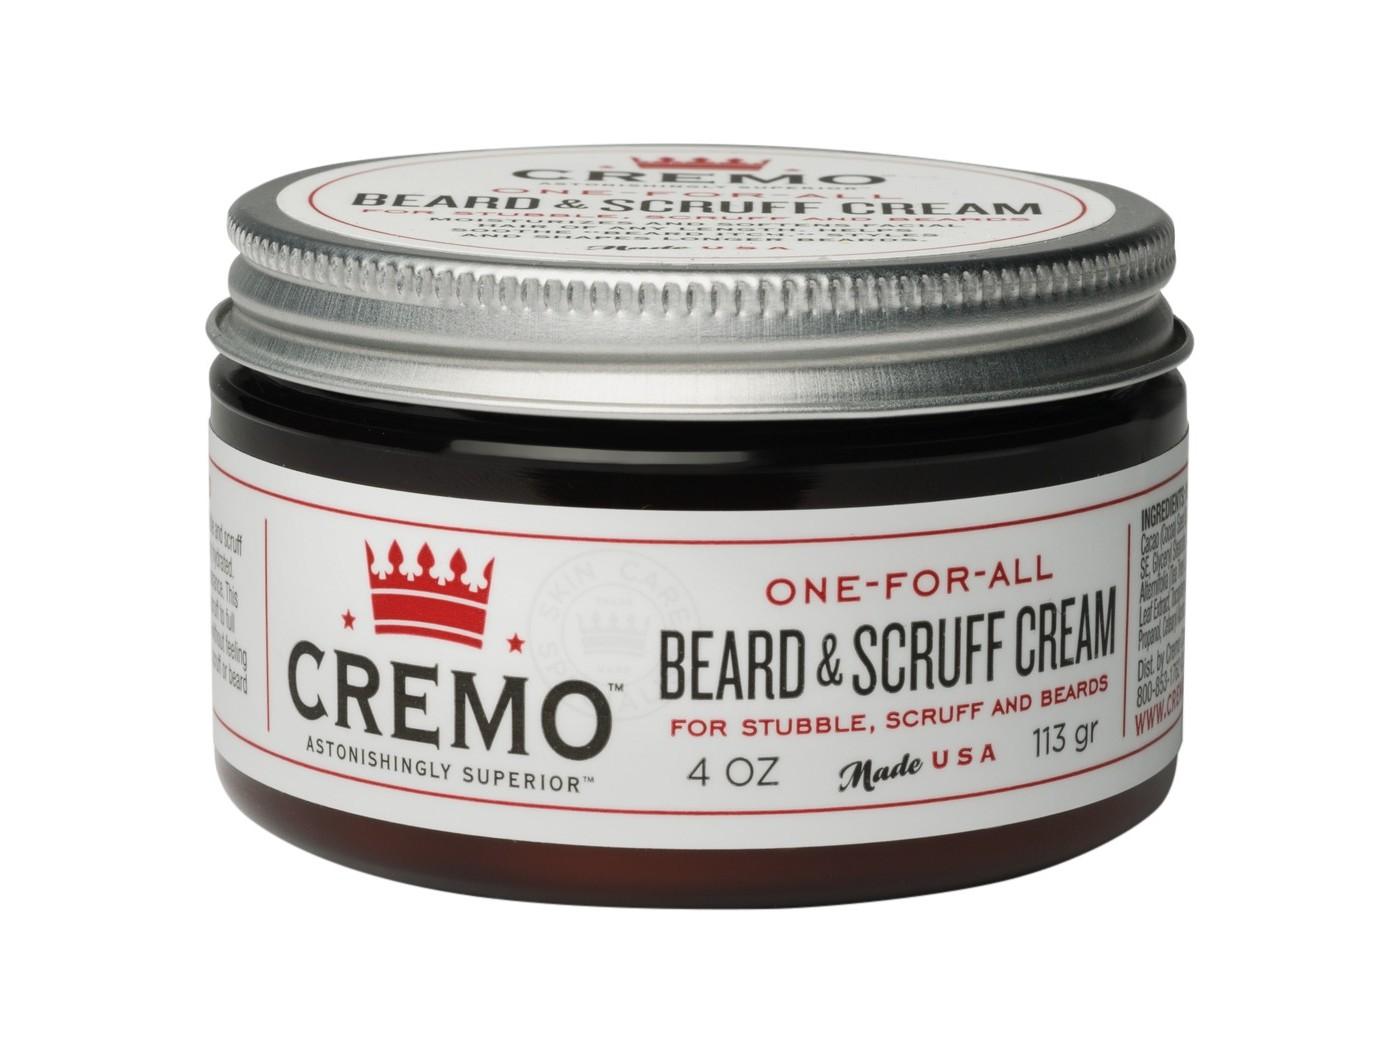 beardscruff